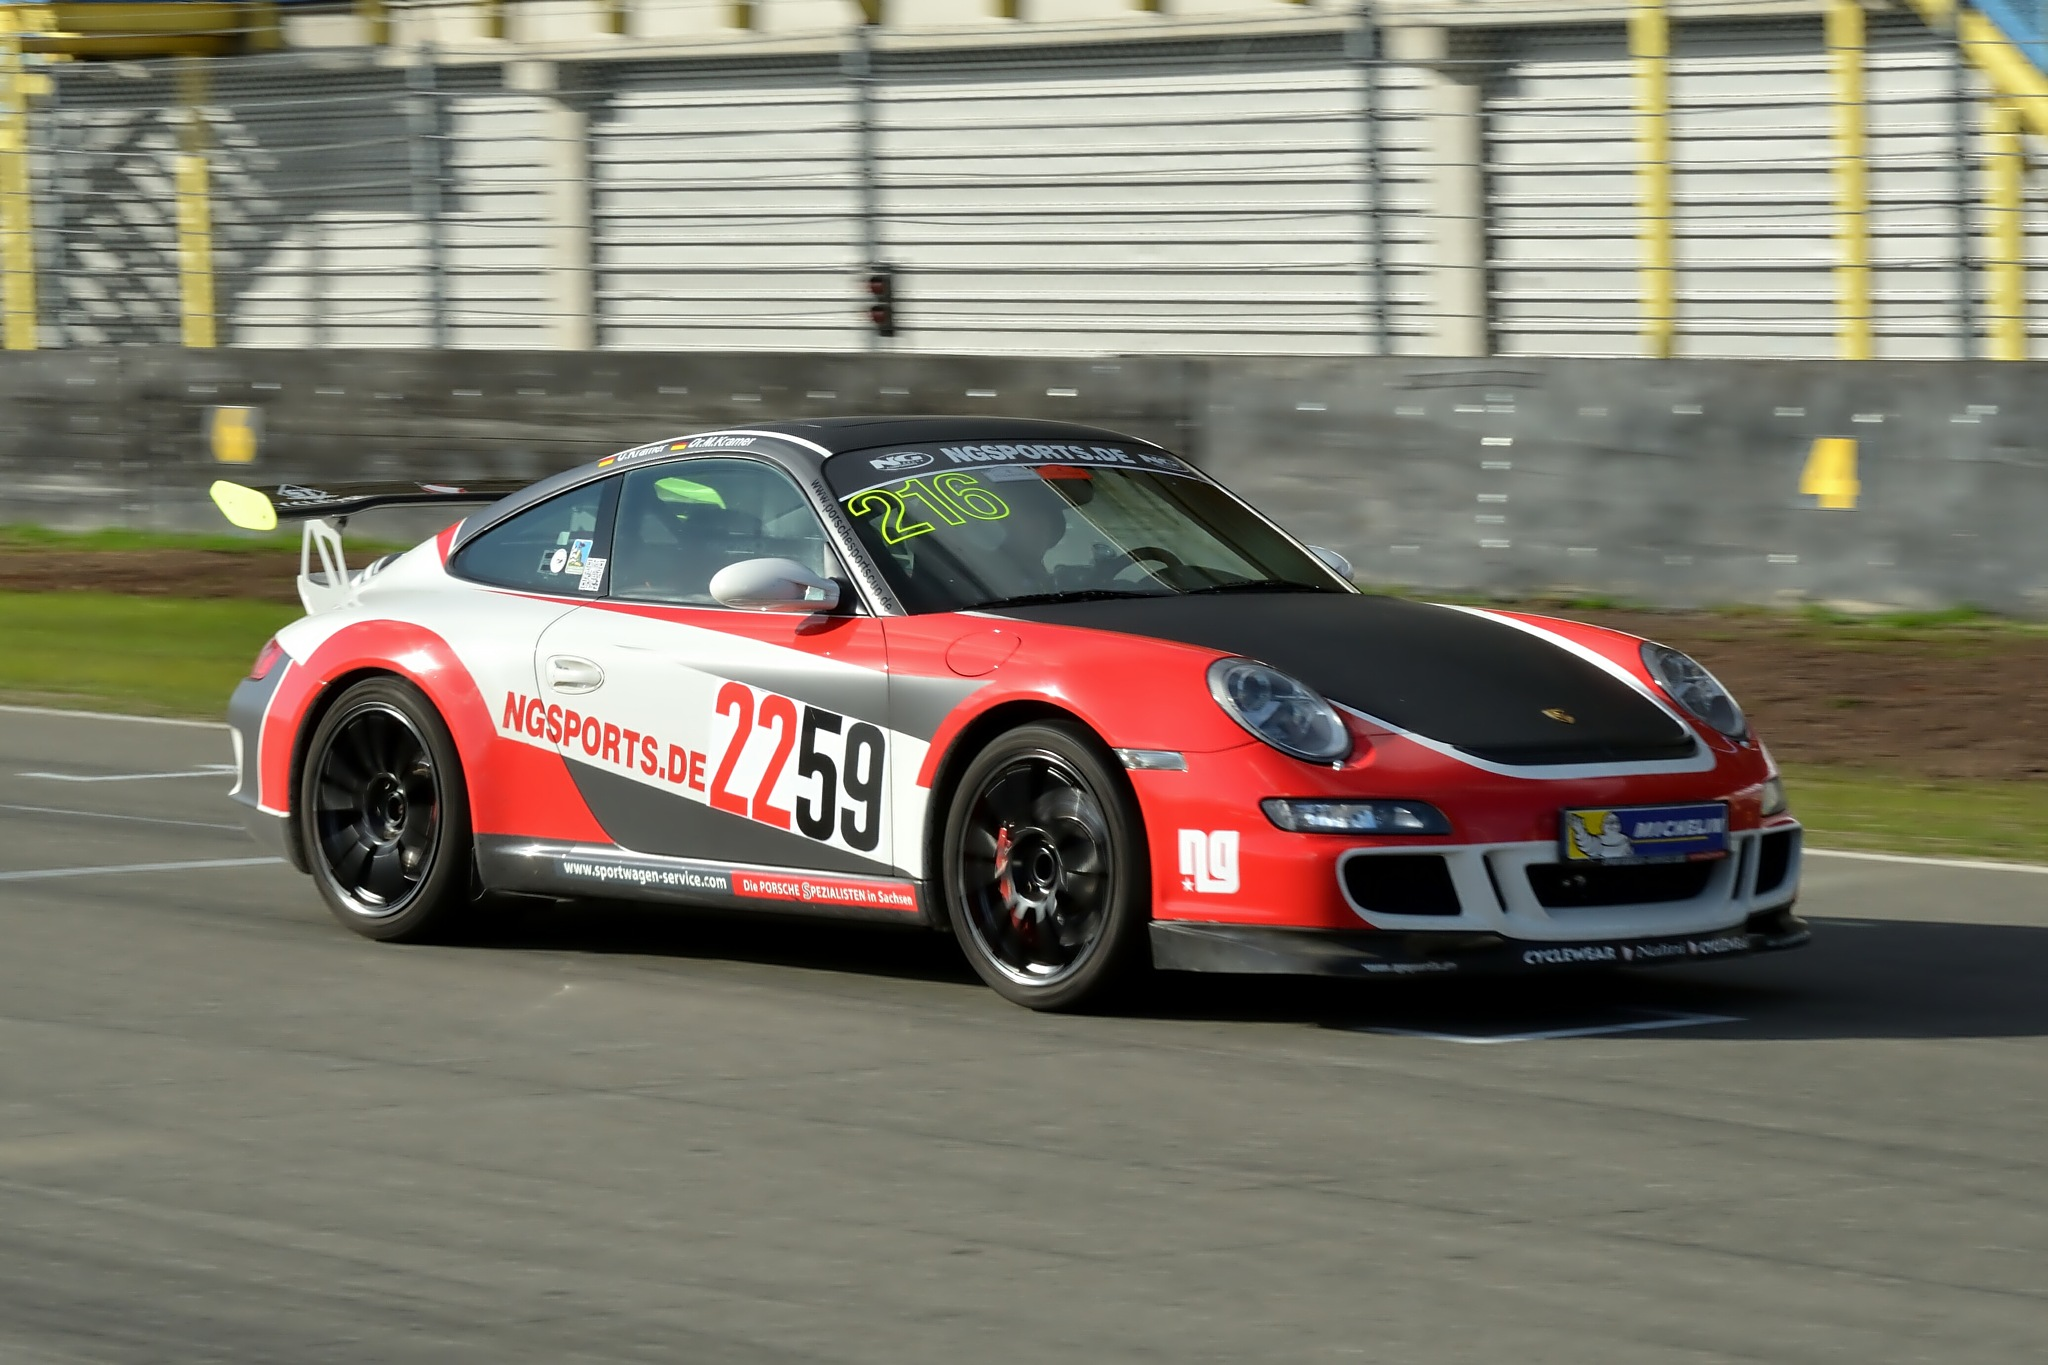 Porsche 911 GT3 by Henk Meima